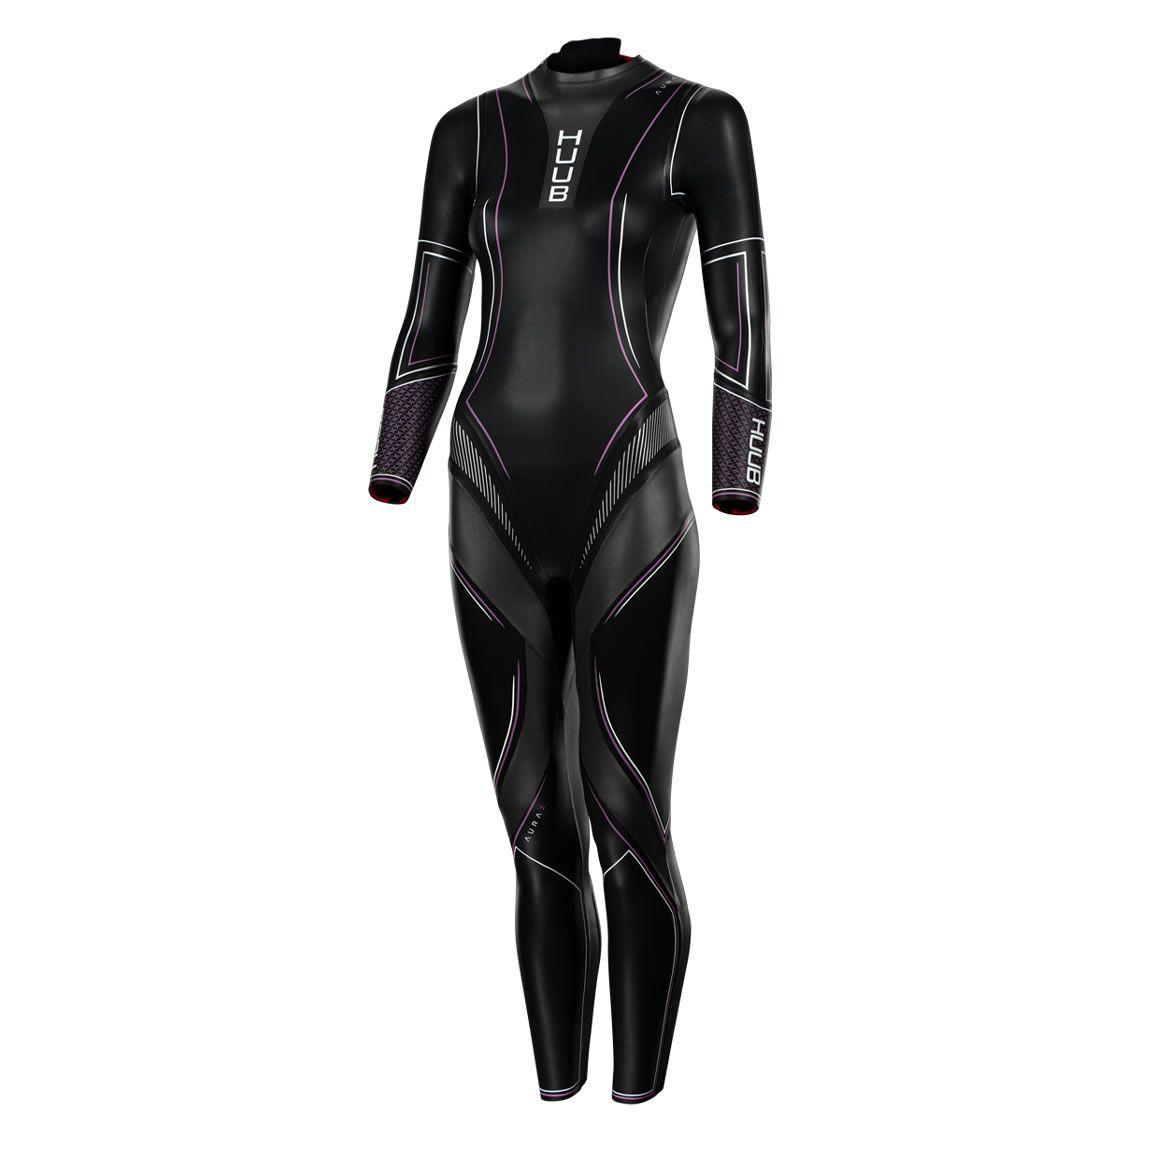 HUUB Aura II 3:3 Triathlon Neoprenanzug Damen - schwarz/lila